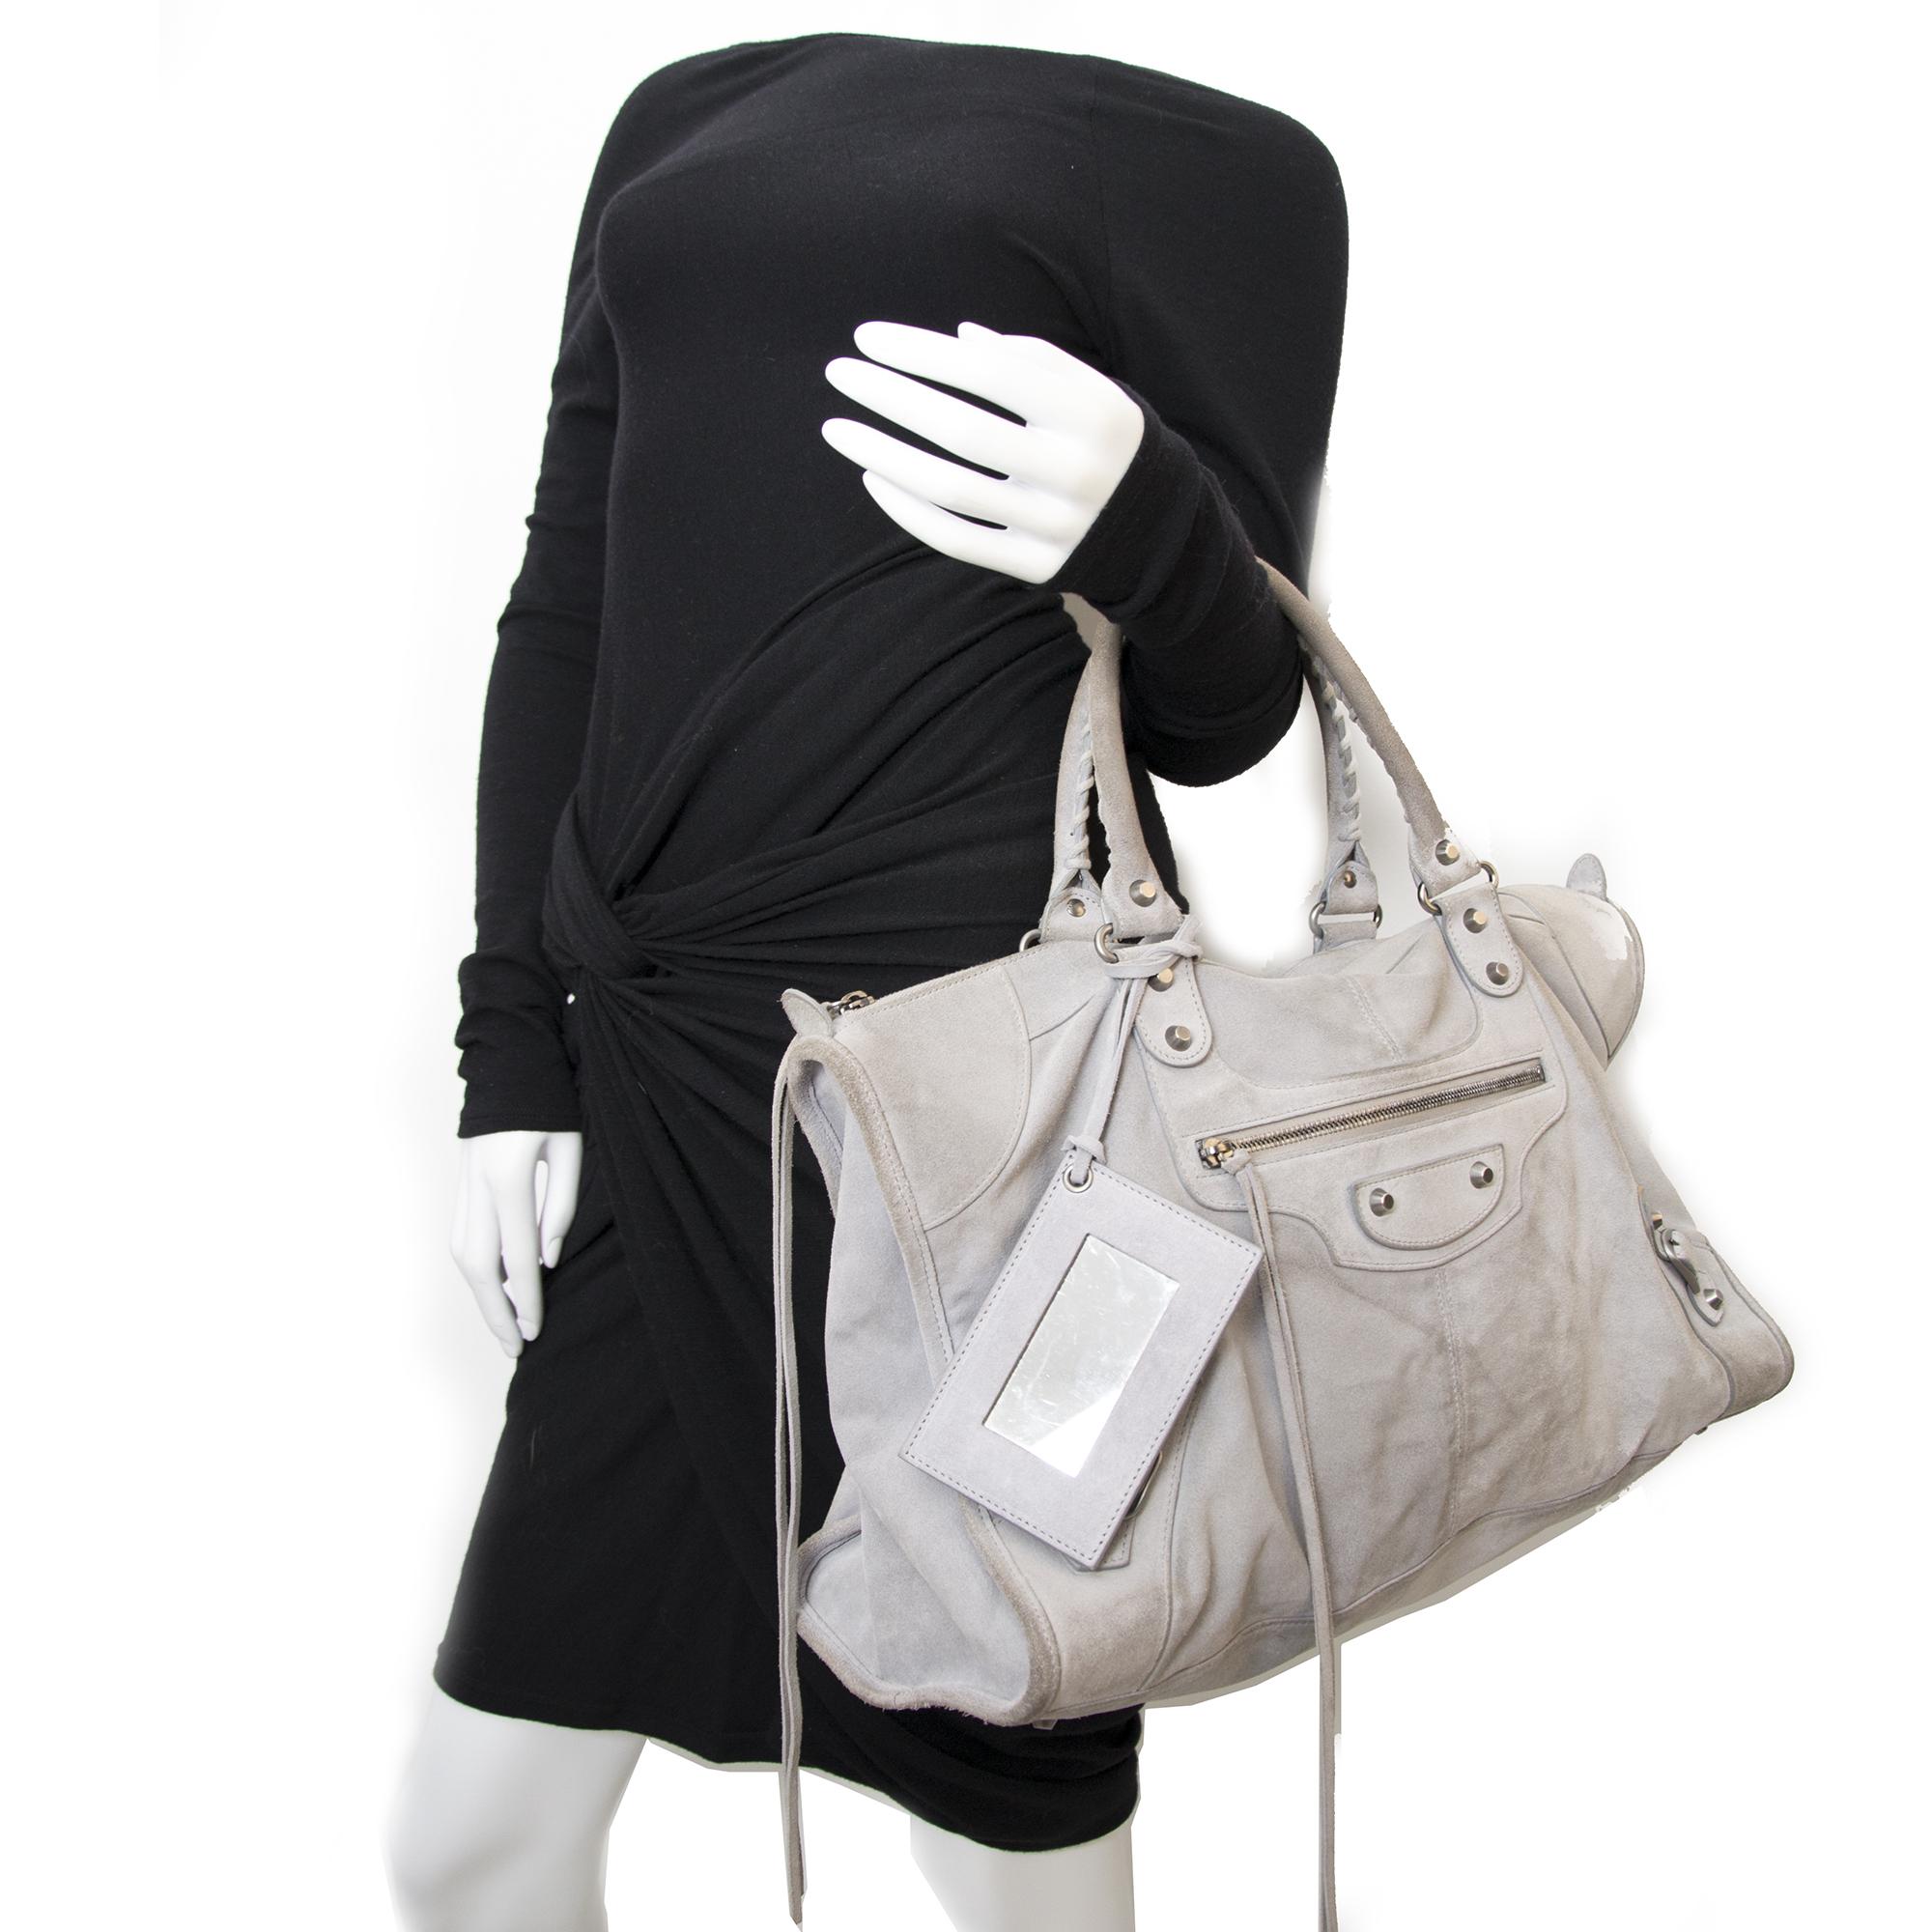 c4a4c68ef12 Safe and Vintage Balenciaga work bag for the best price at Labellov  webshop. Safe and secure online